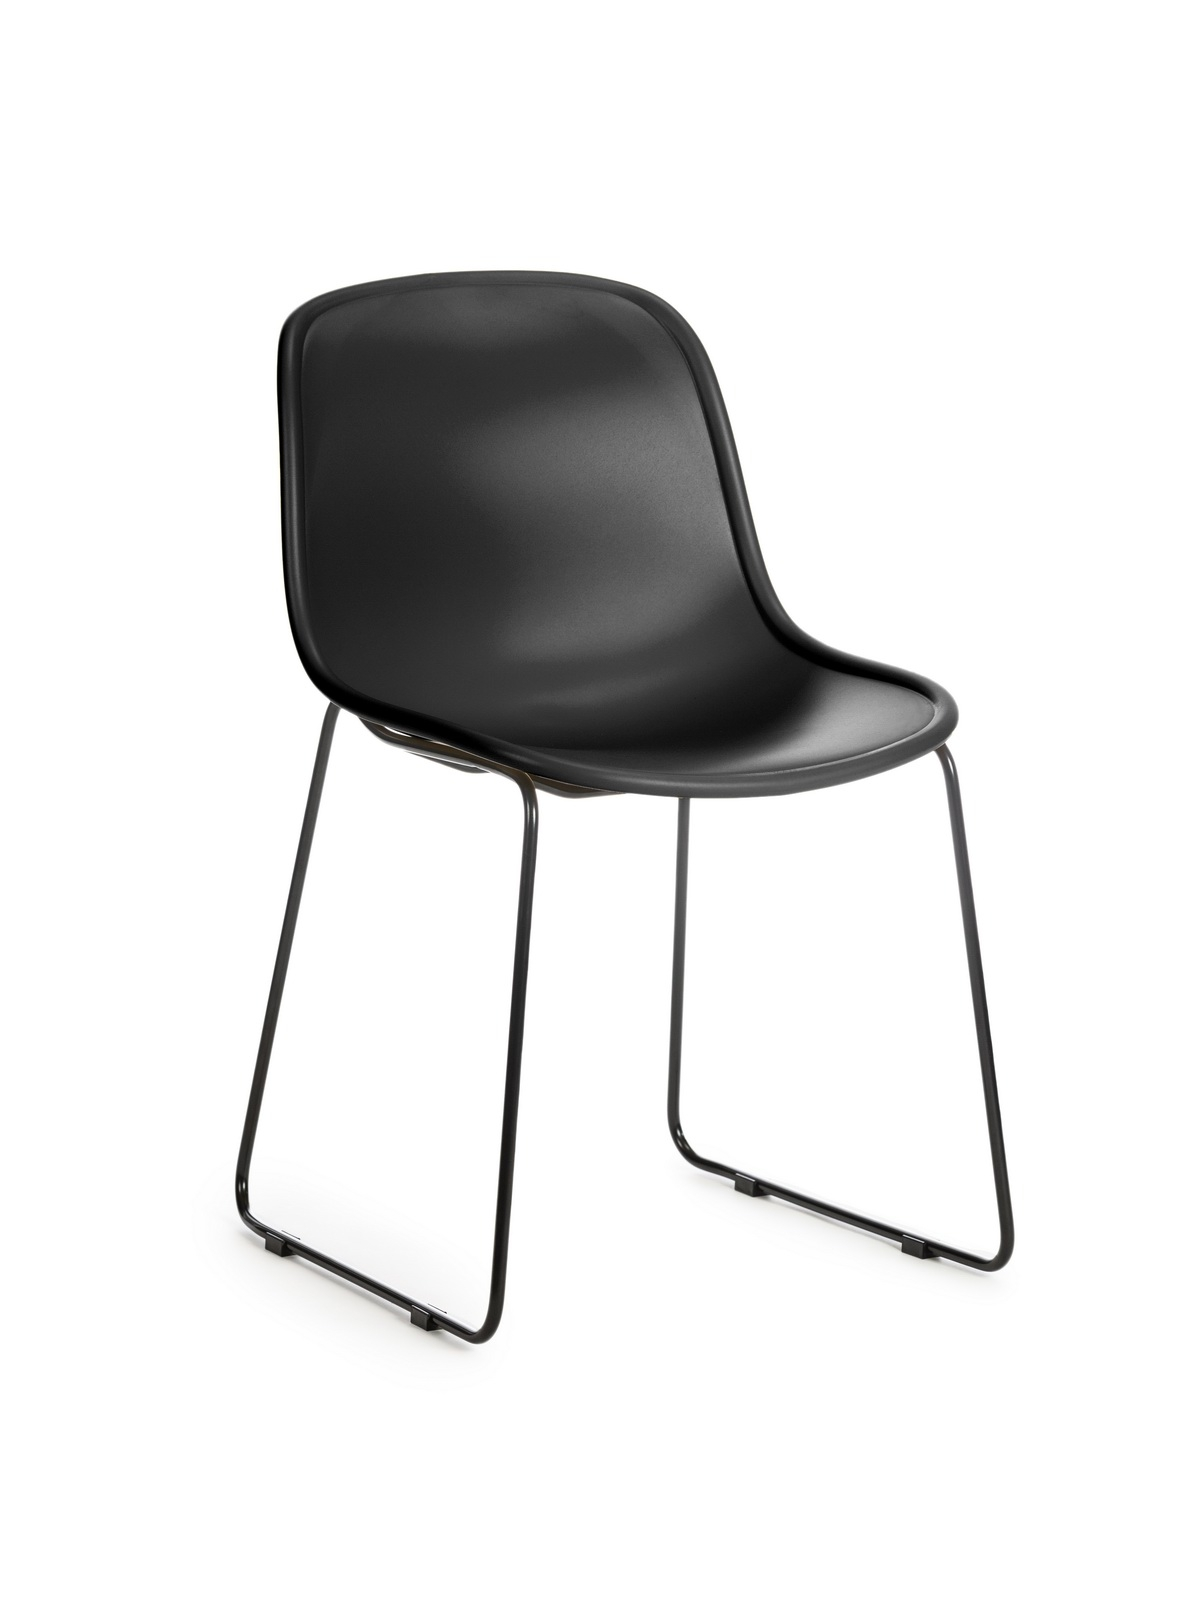 Scaun din plastic, cu picioare metalice Cosmo Black, l57xA54xH78cm imagine